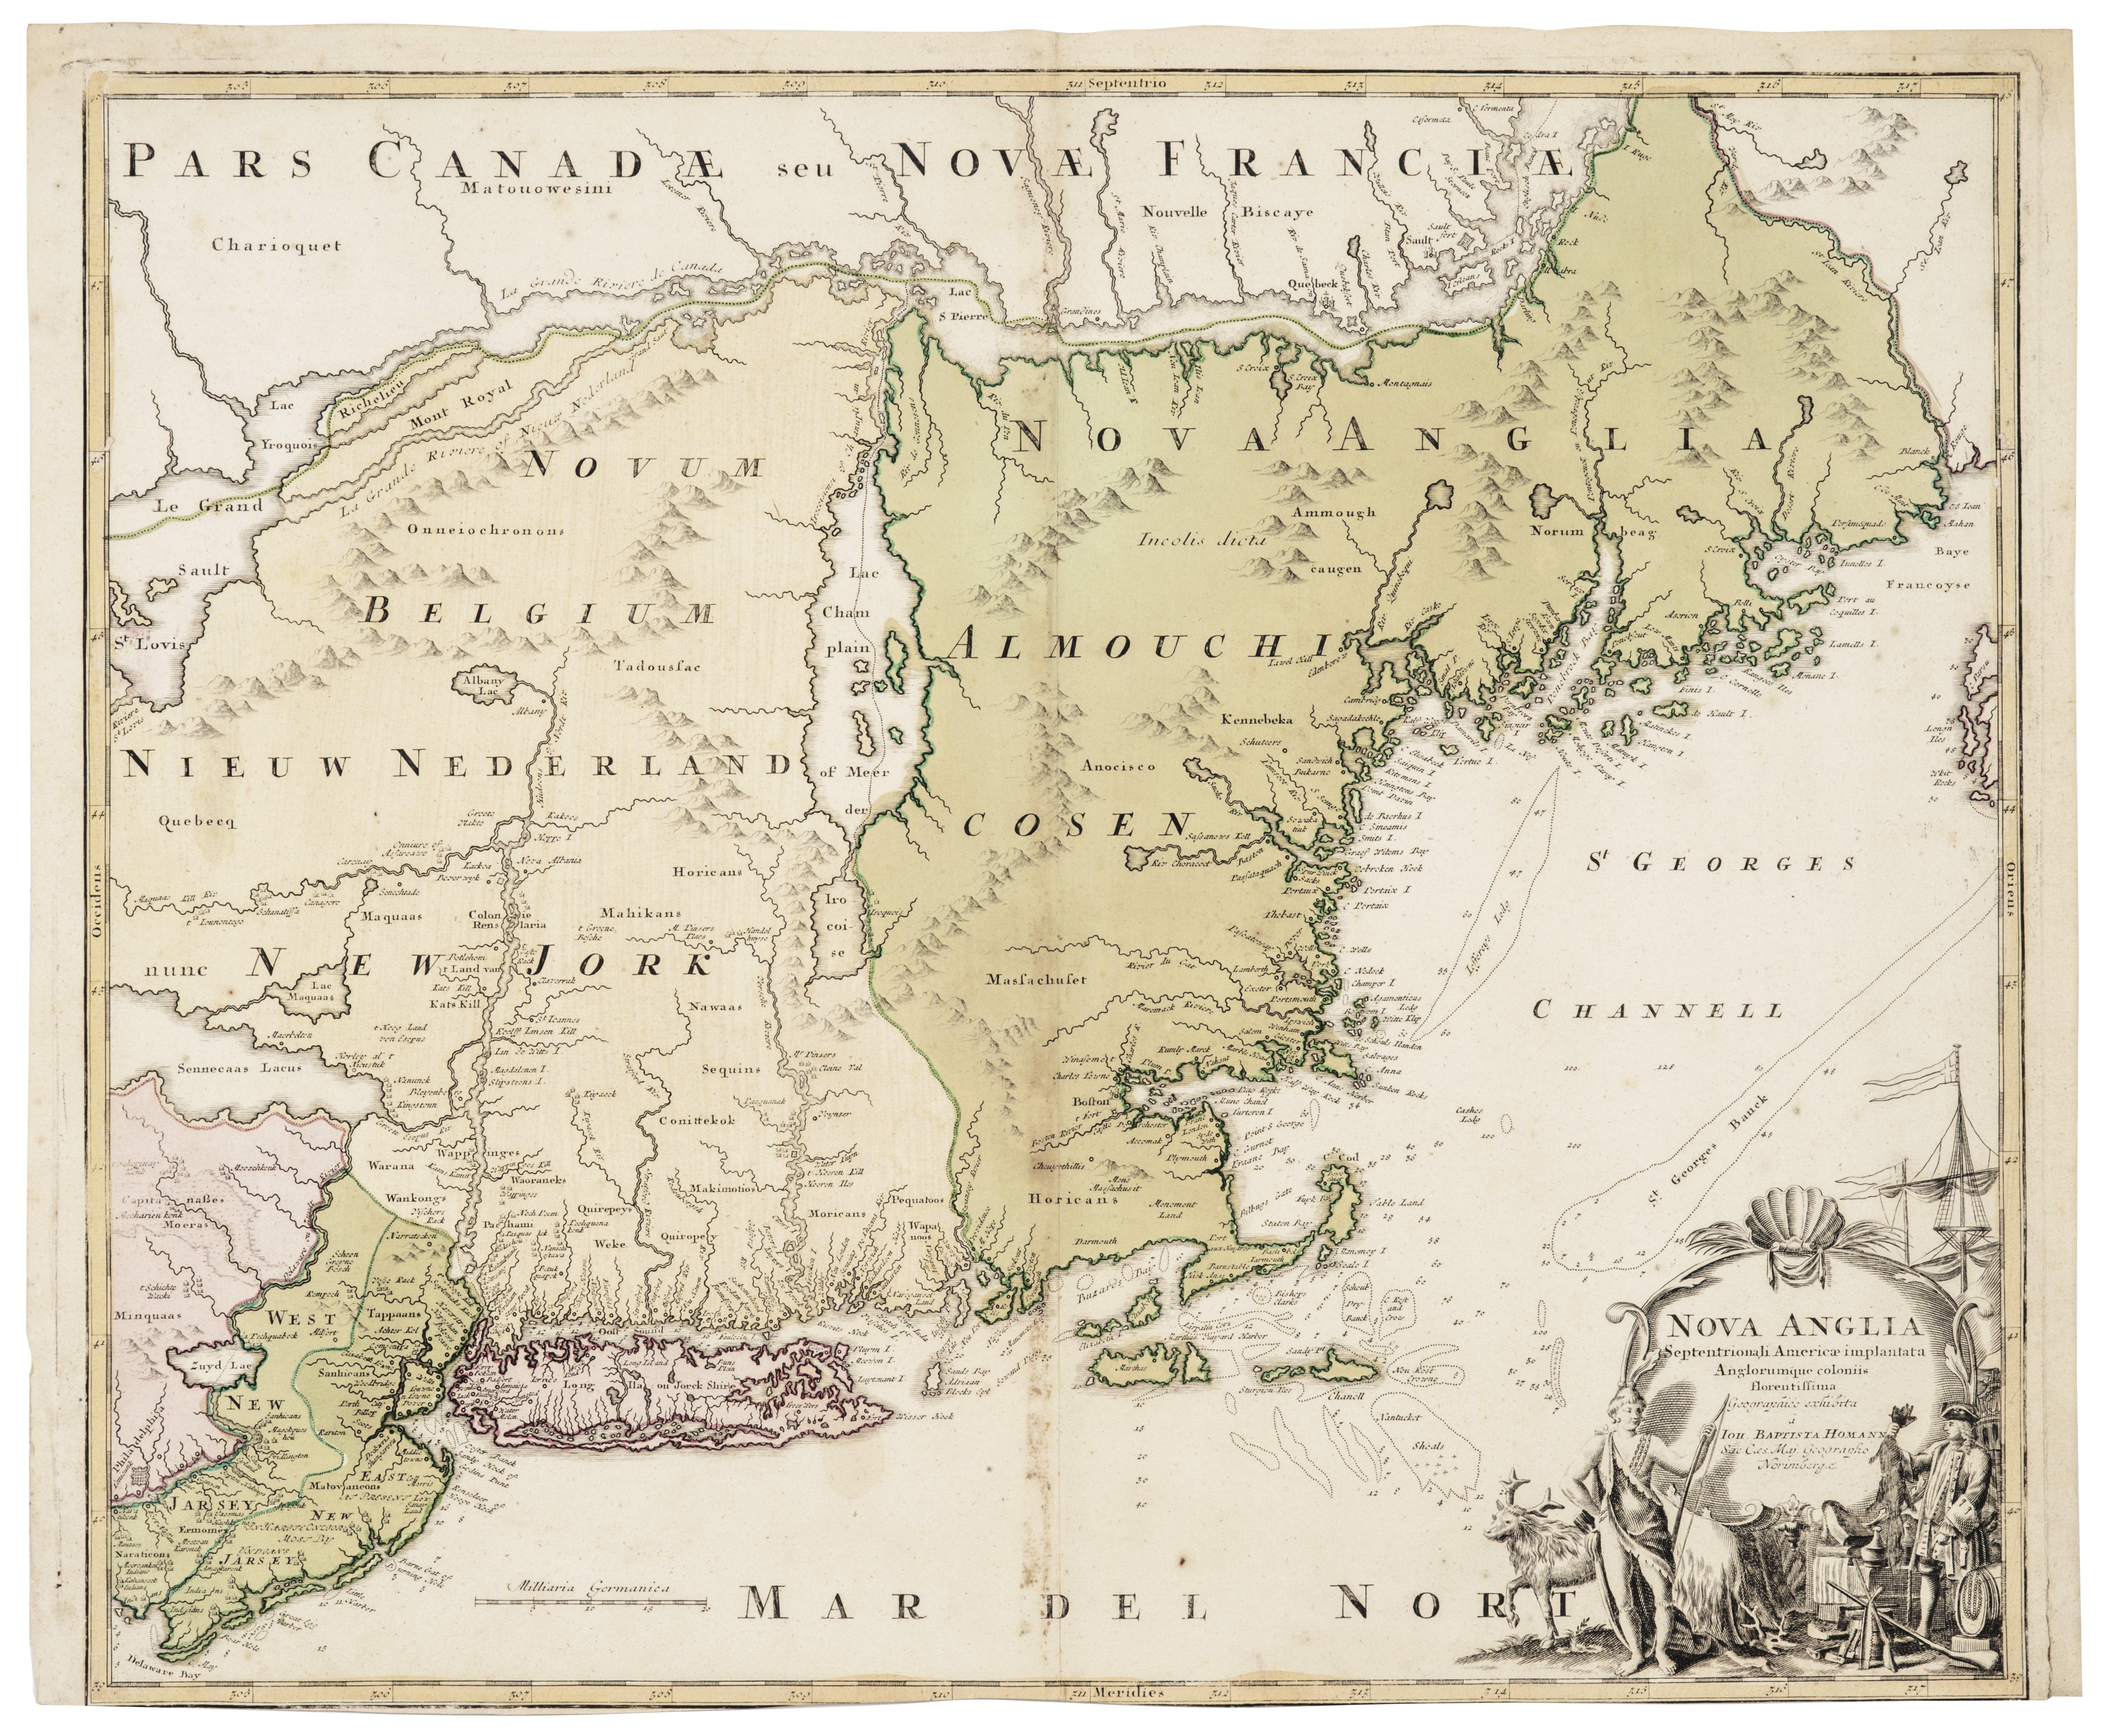 Nova Anglia America Implantata Antique Map Of New York By Baptista Homann